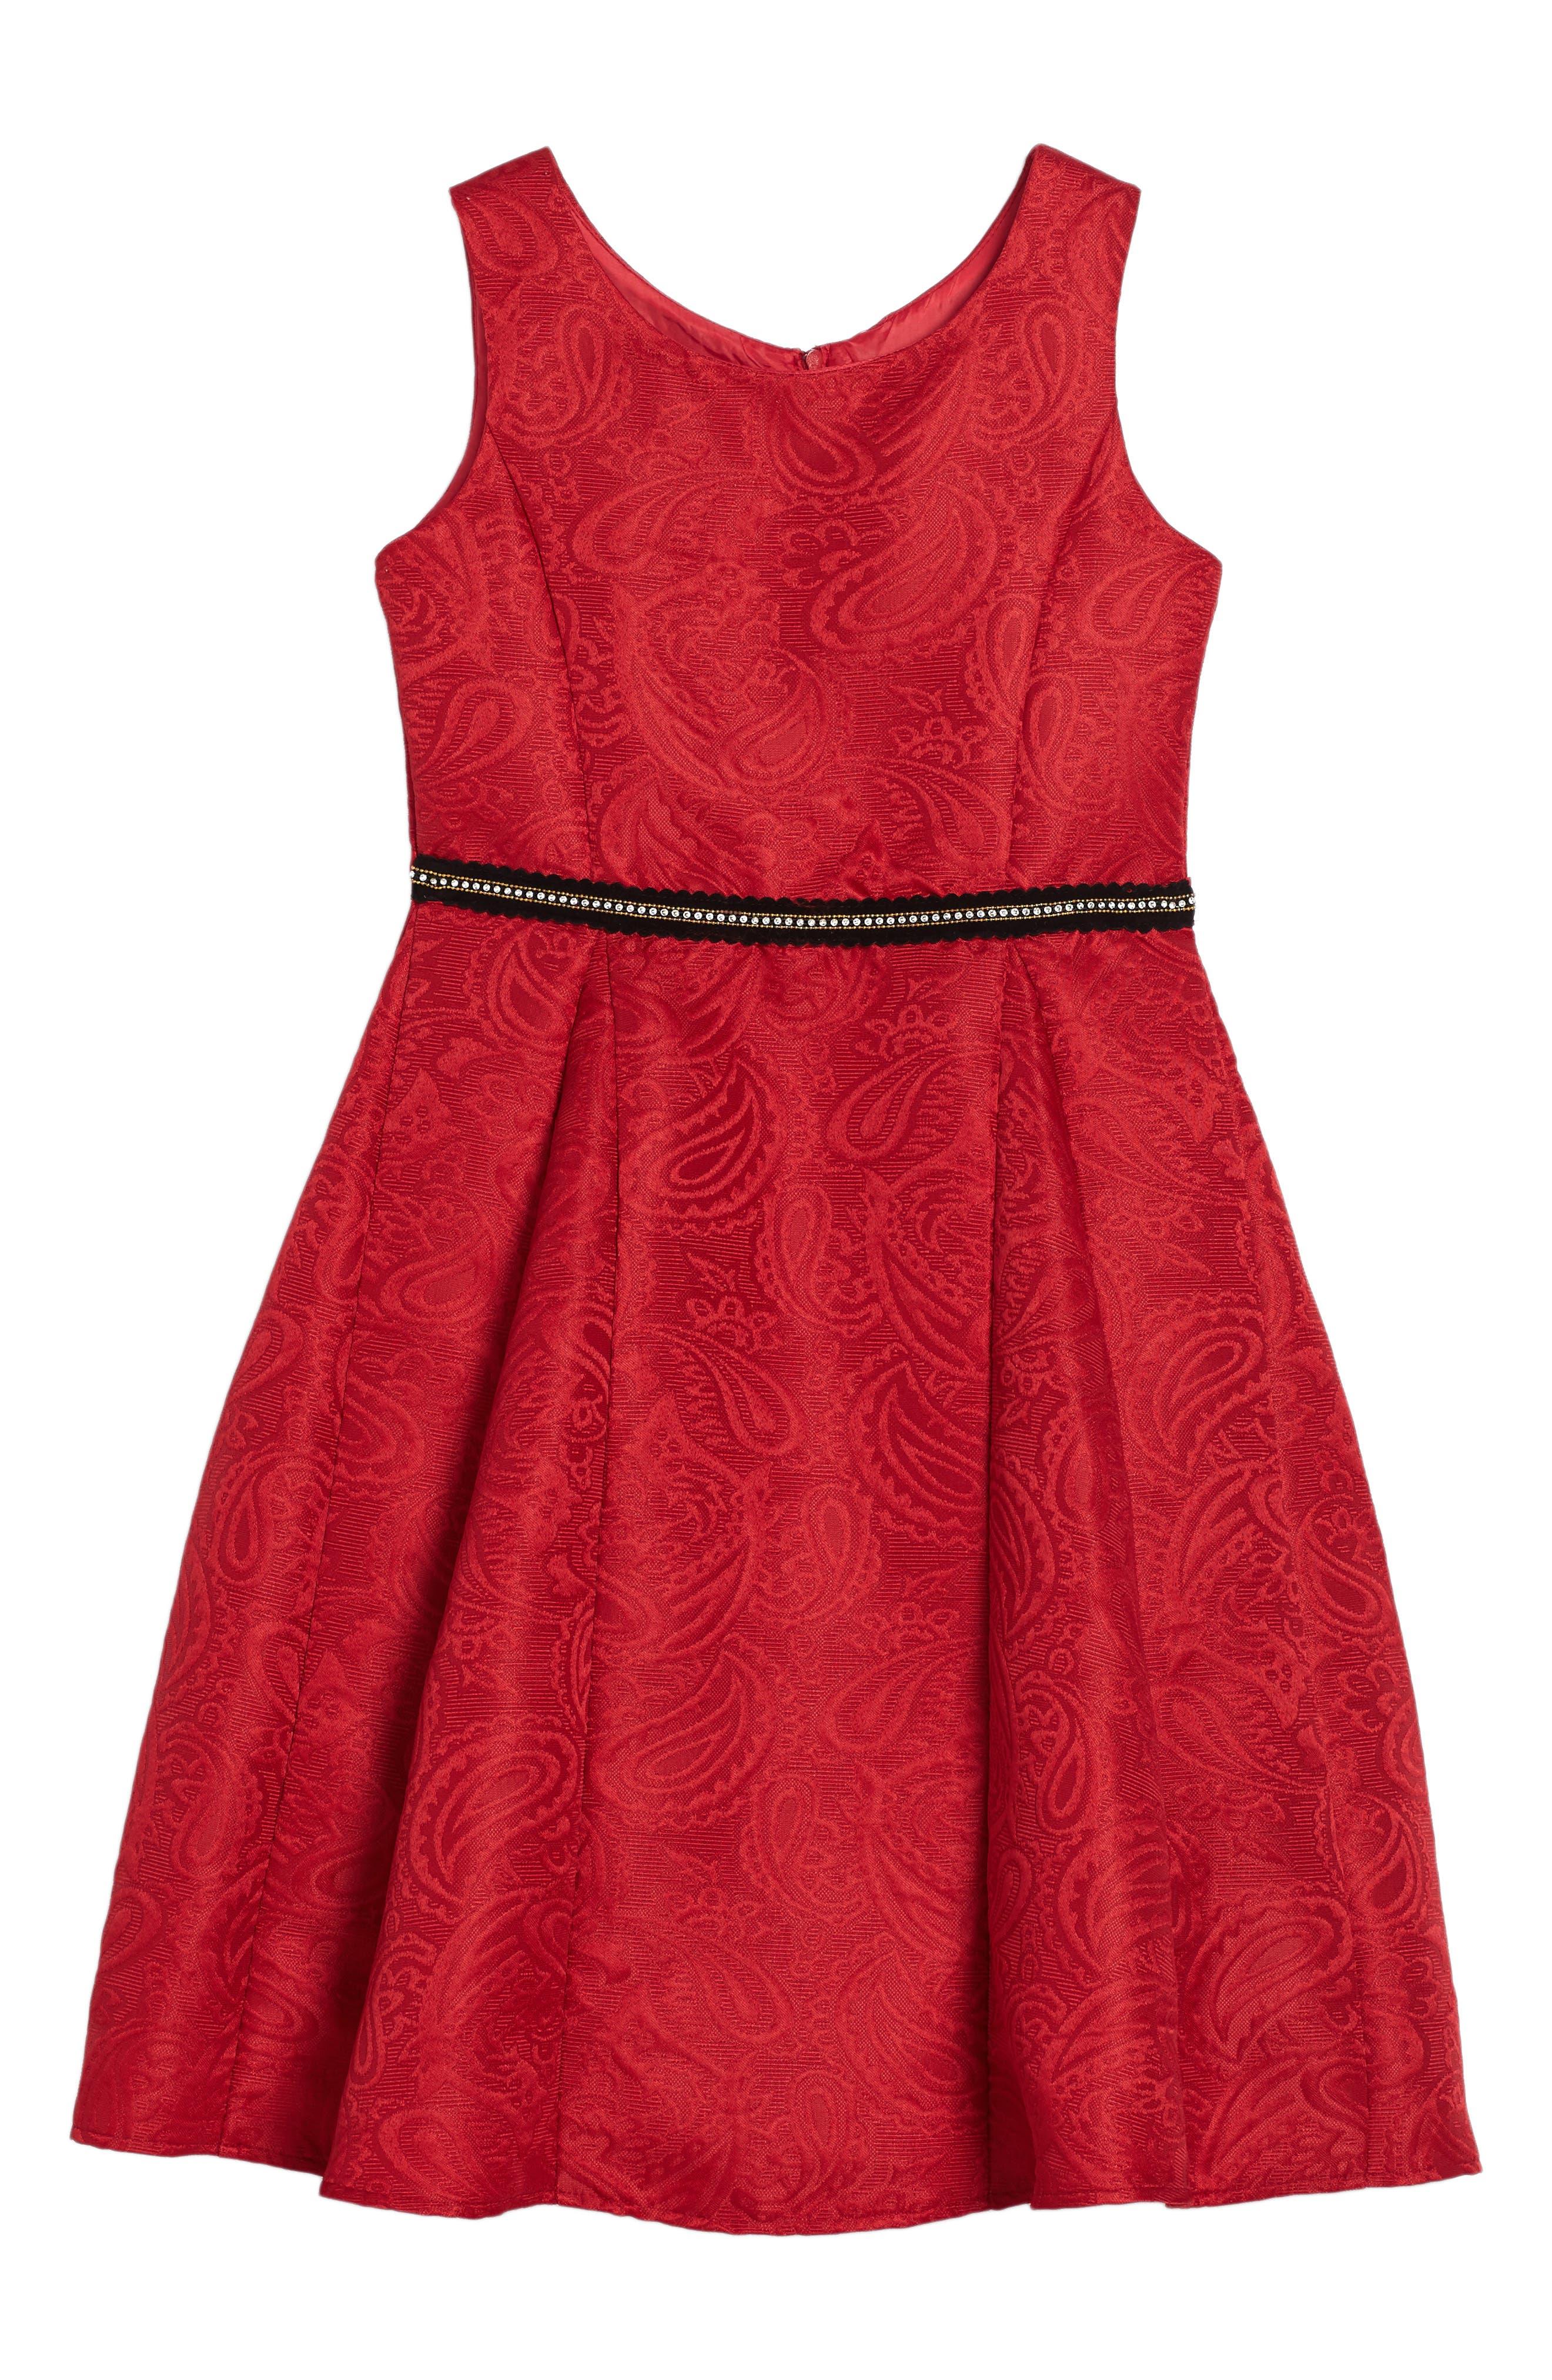 Alternate Image 1 Selected - Dorissa Hannah Jacquard Dress (Toddler Girls, Little Girls & Big Girls)